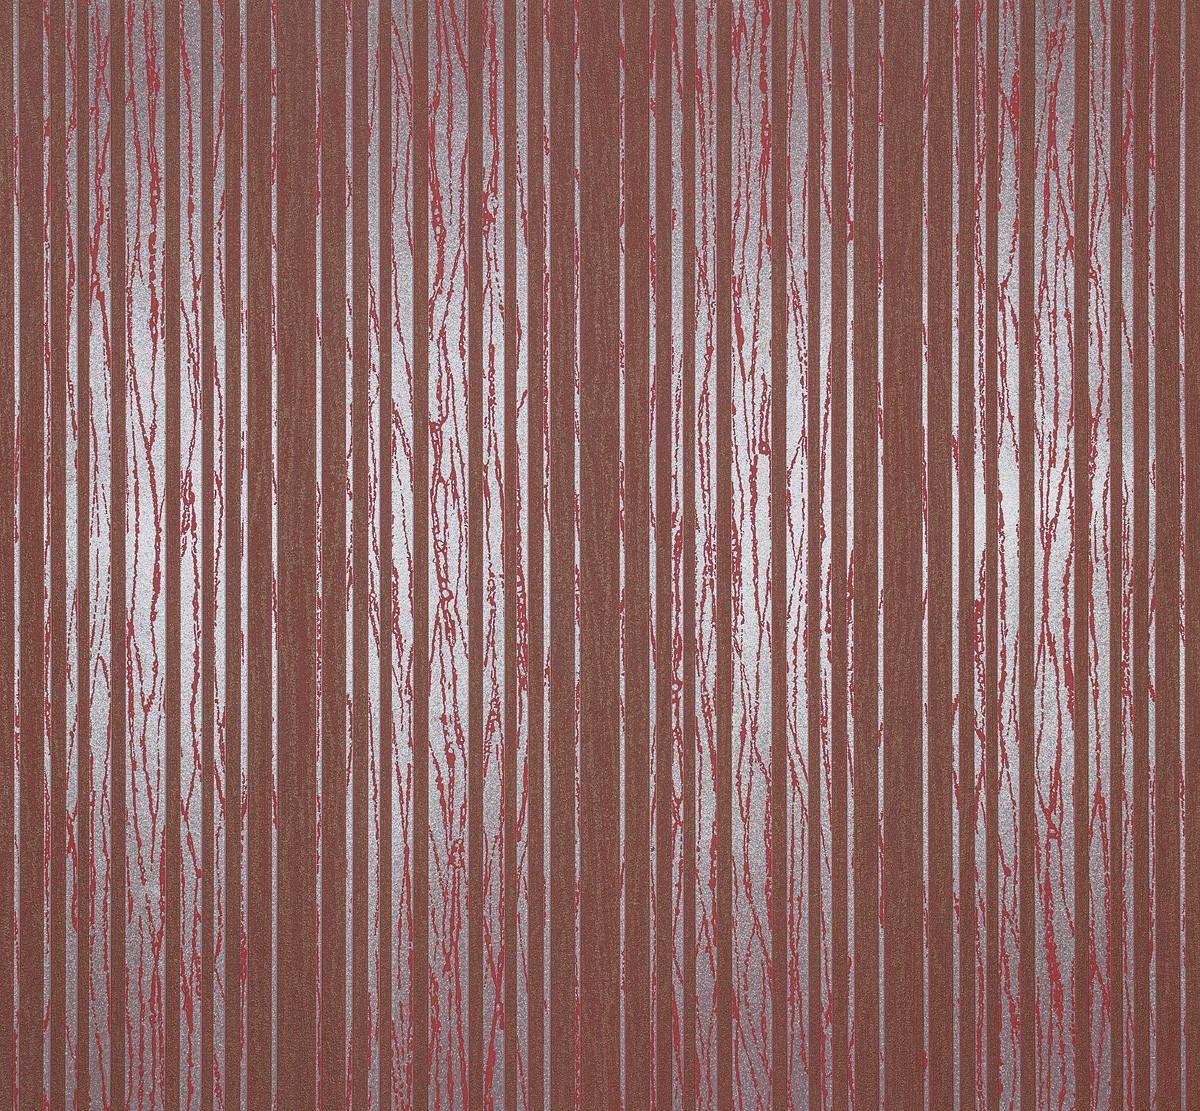 vliestapete streifen rot silber metallic tapete marburg. Black Bedroom Furniture Sets. Home Design Ideas